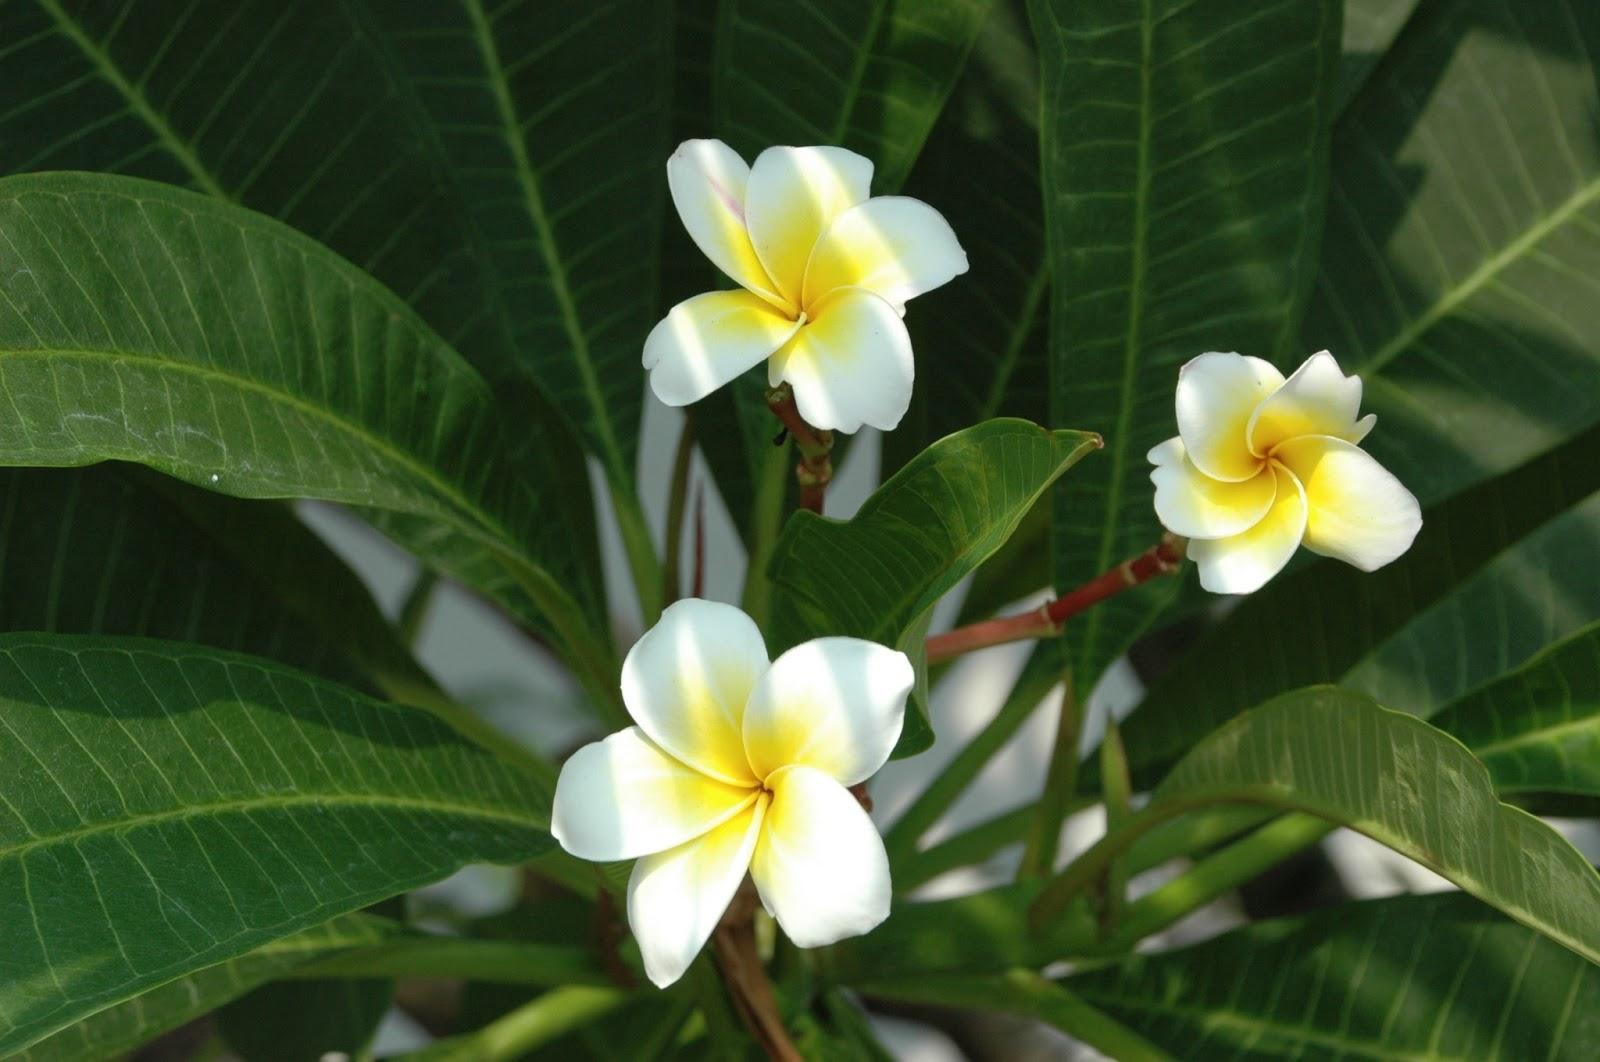 Paleteria Flor De Mayo